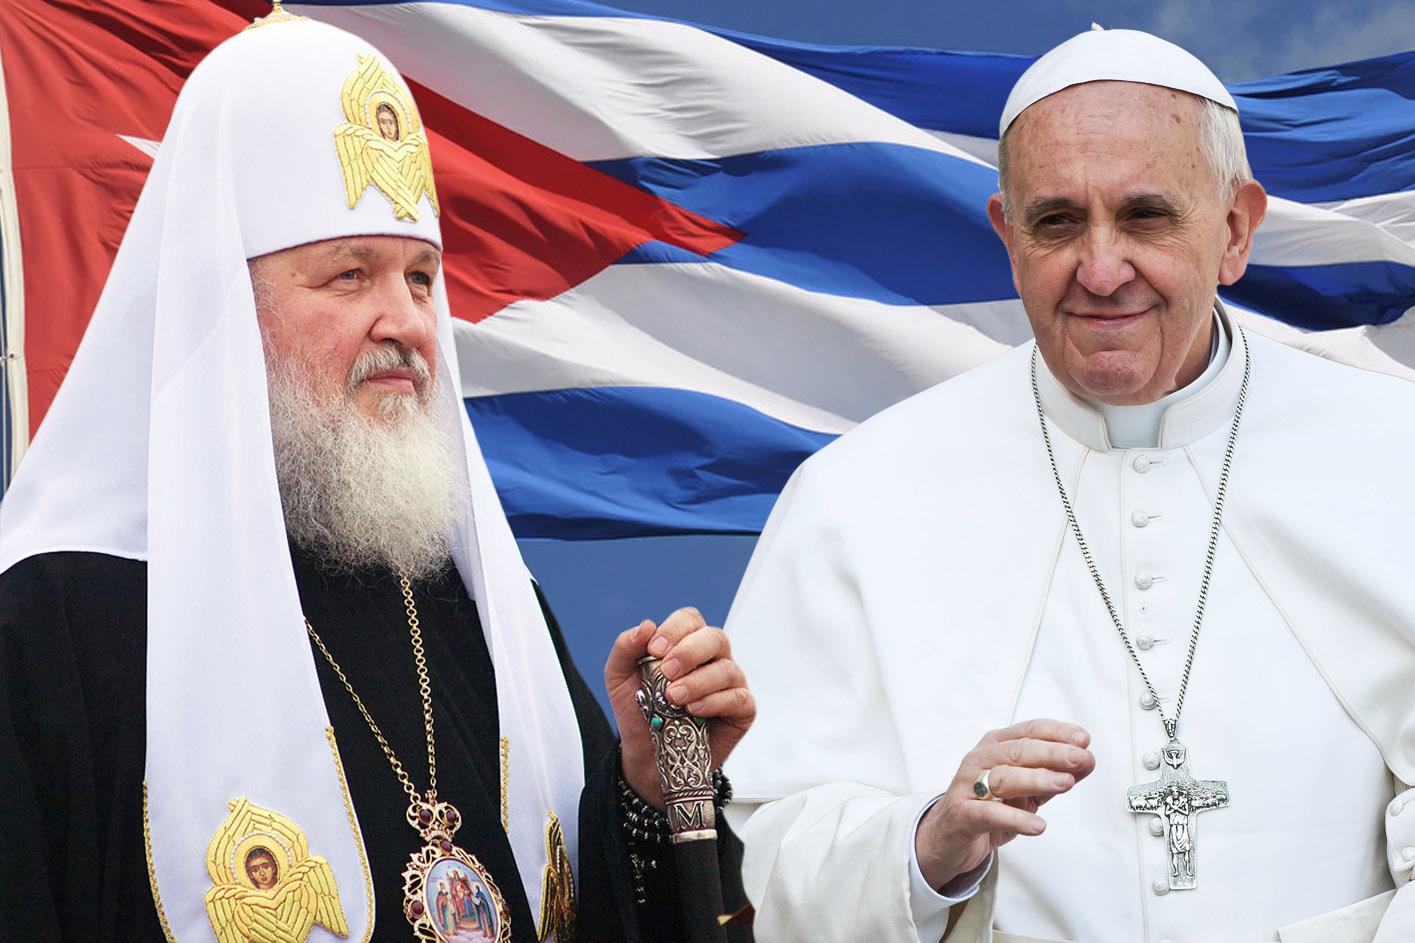 WEB-CUBA-POPE FRANCIS-PATRIARCH-KIRILL-Serge Serebro, Vitebsk Popular News -© Mazur-catholicnewsorguk-Stefano Liboni-cc